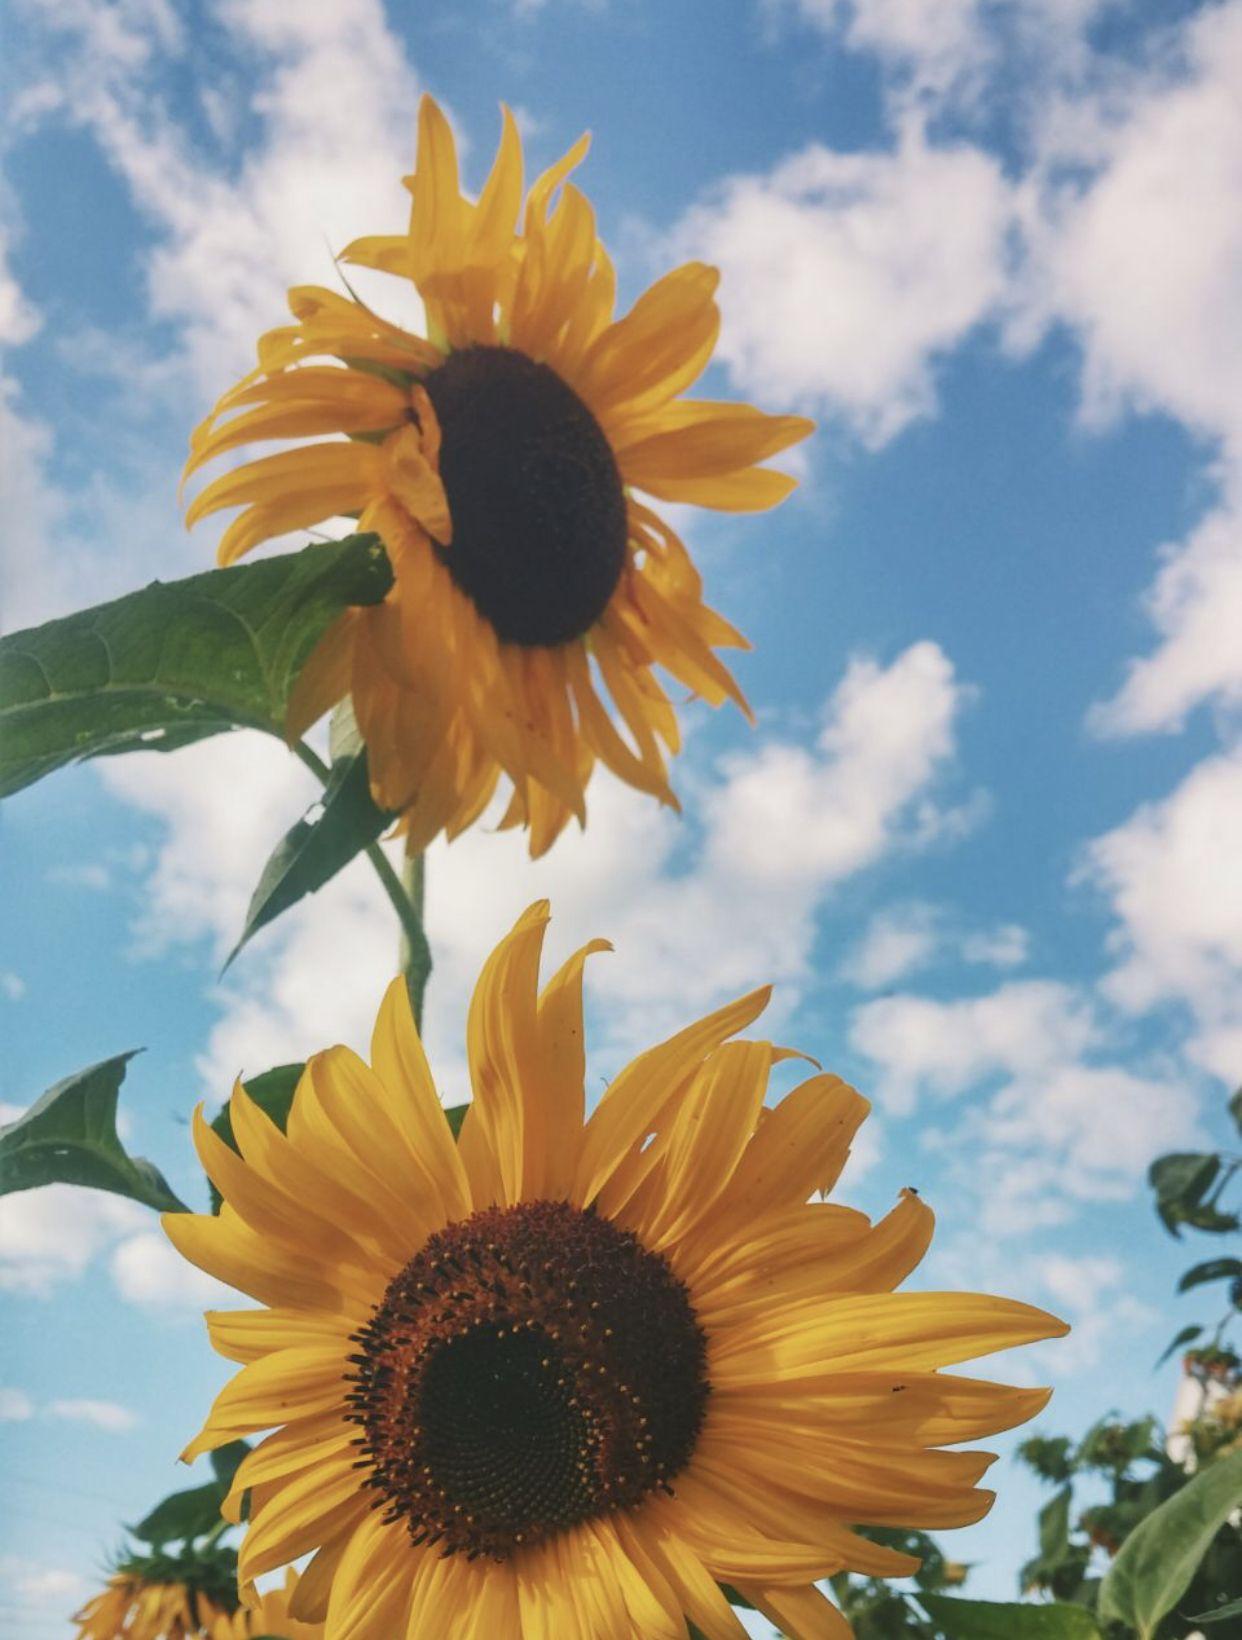 Pin by خليفه on خلفيات in 2020 Sunflower iphone